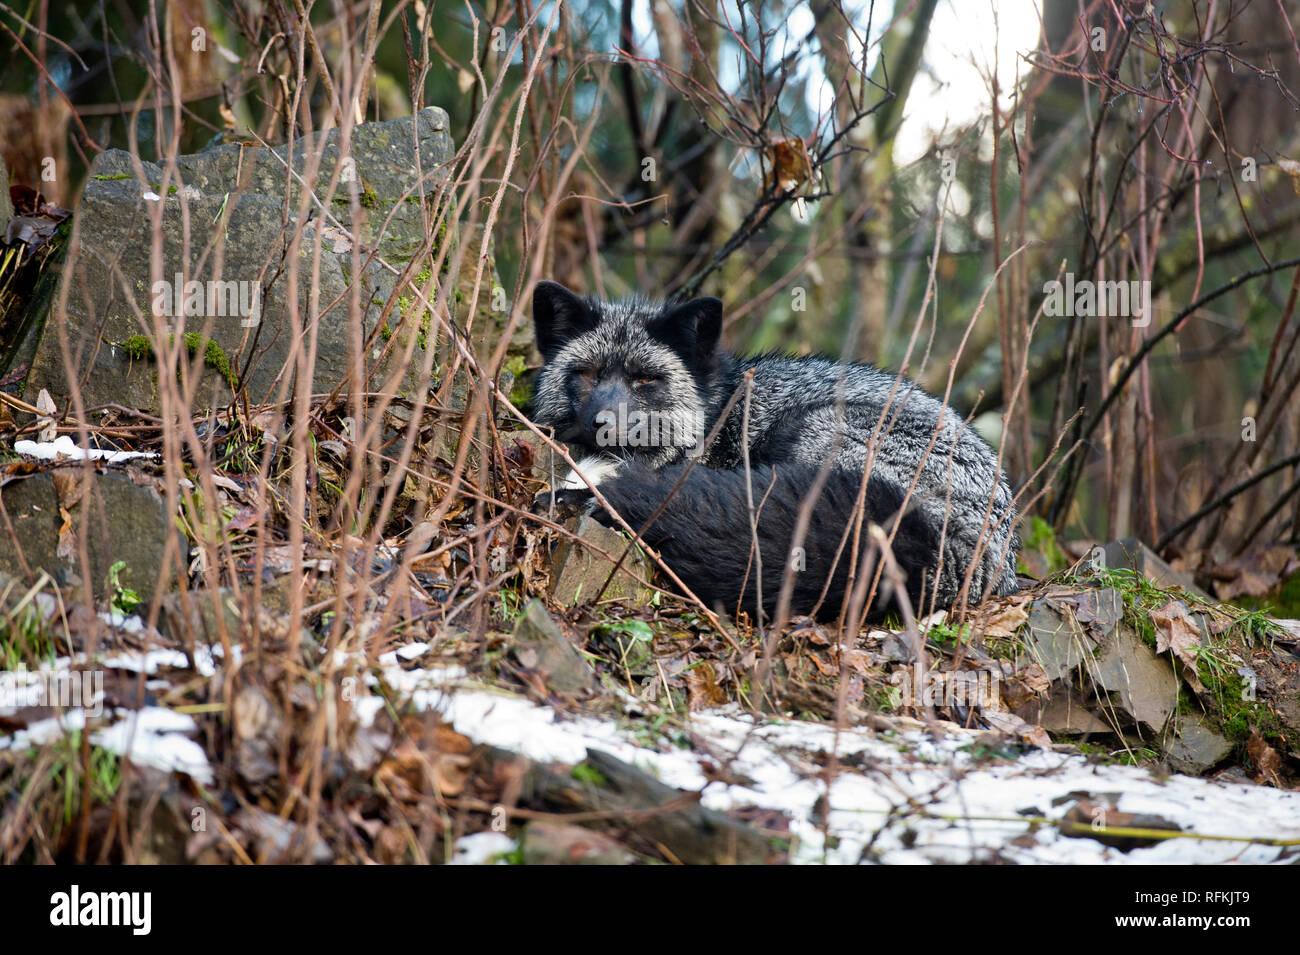 Captive silver fox (melanistic form of red fox - Vulpes vulpes) at Kroschel Films Wildlife Center near Haines AK - Stock Image